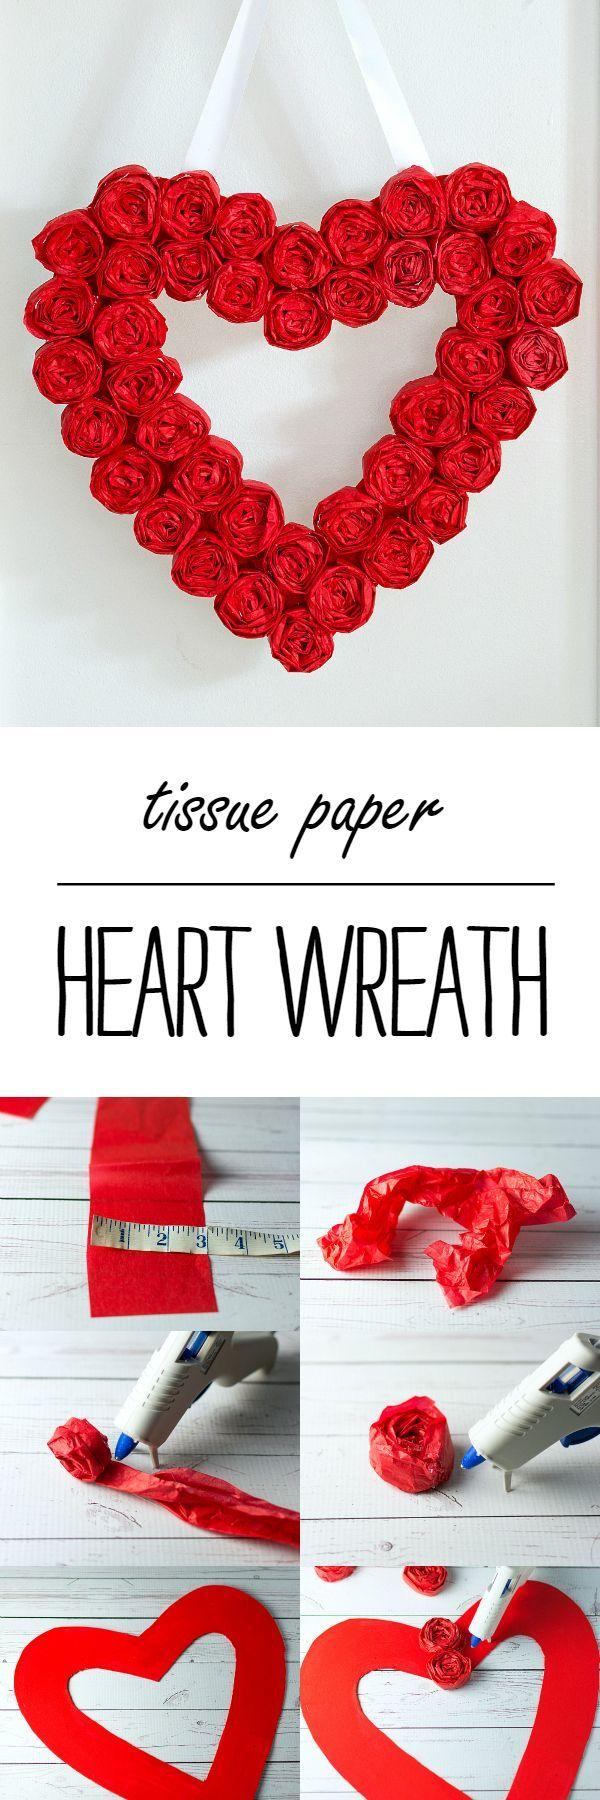 Valentine Wreath Craft Idea - Easy to Make Tissue Paper Rosette Wreath for Valentine's Day